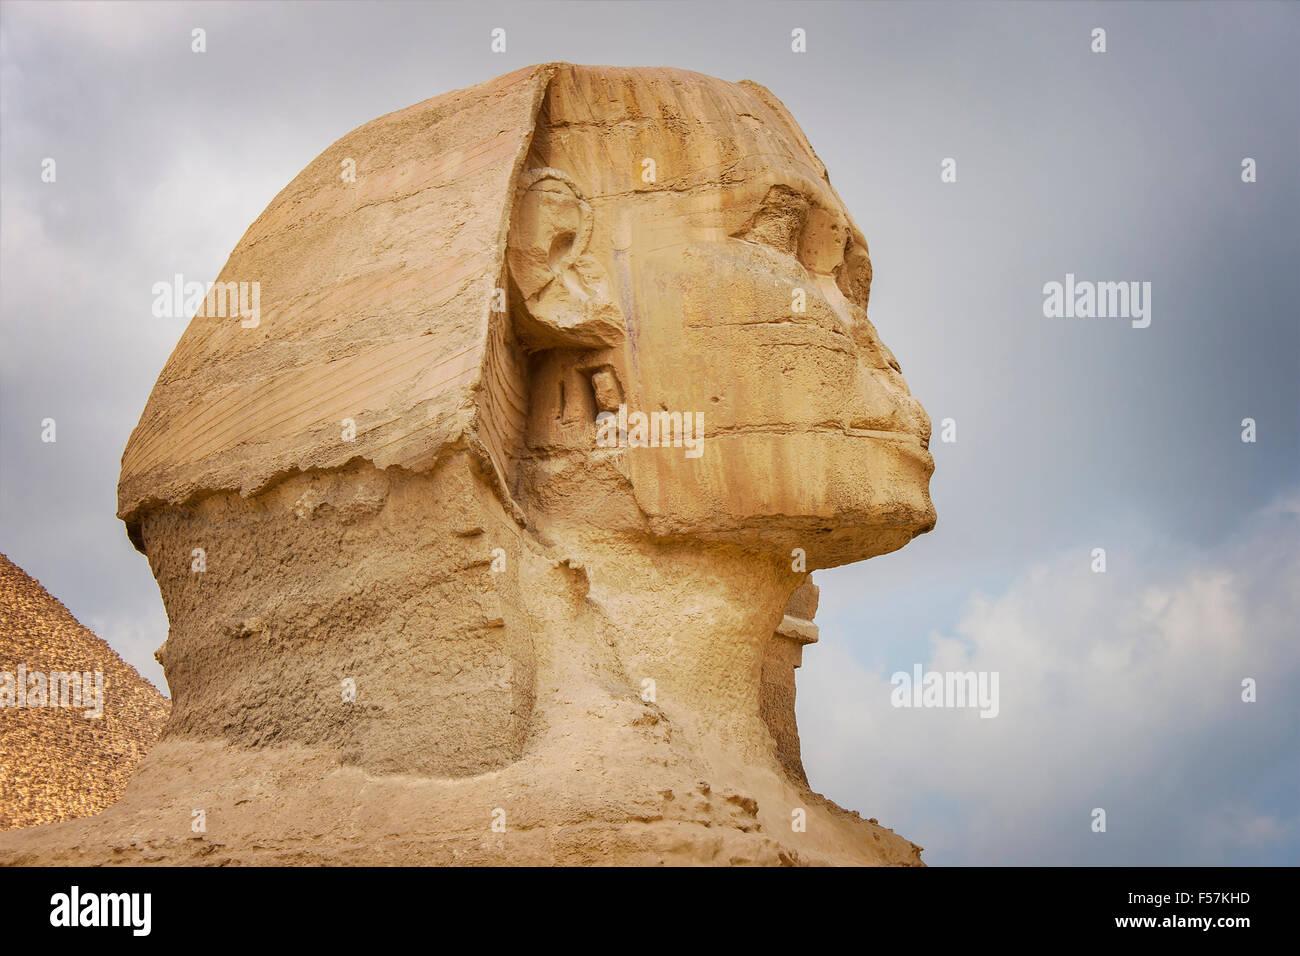 Image of the Sphinx of Gixa, Cairo Egypt. - Stock Image